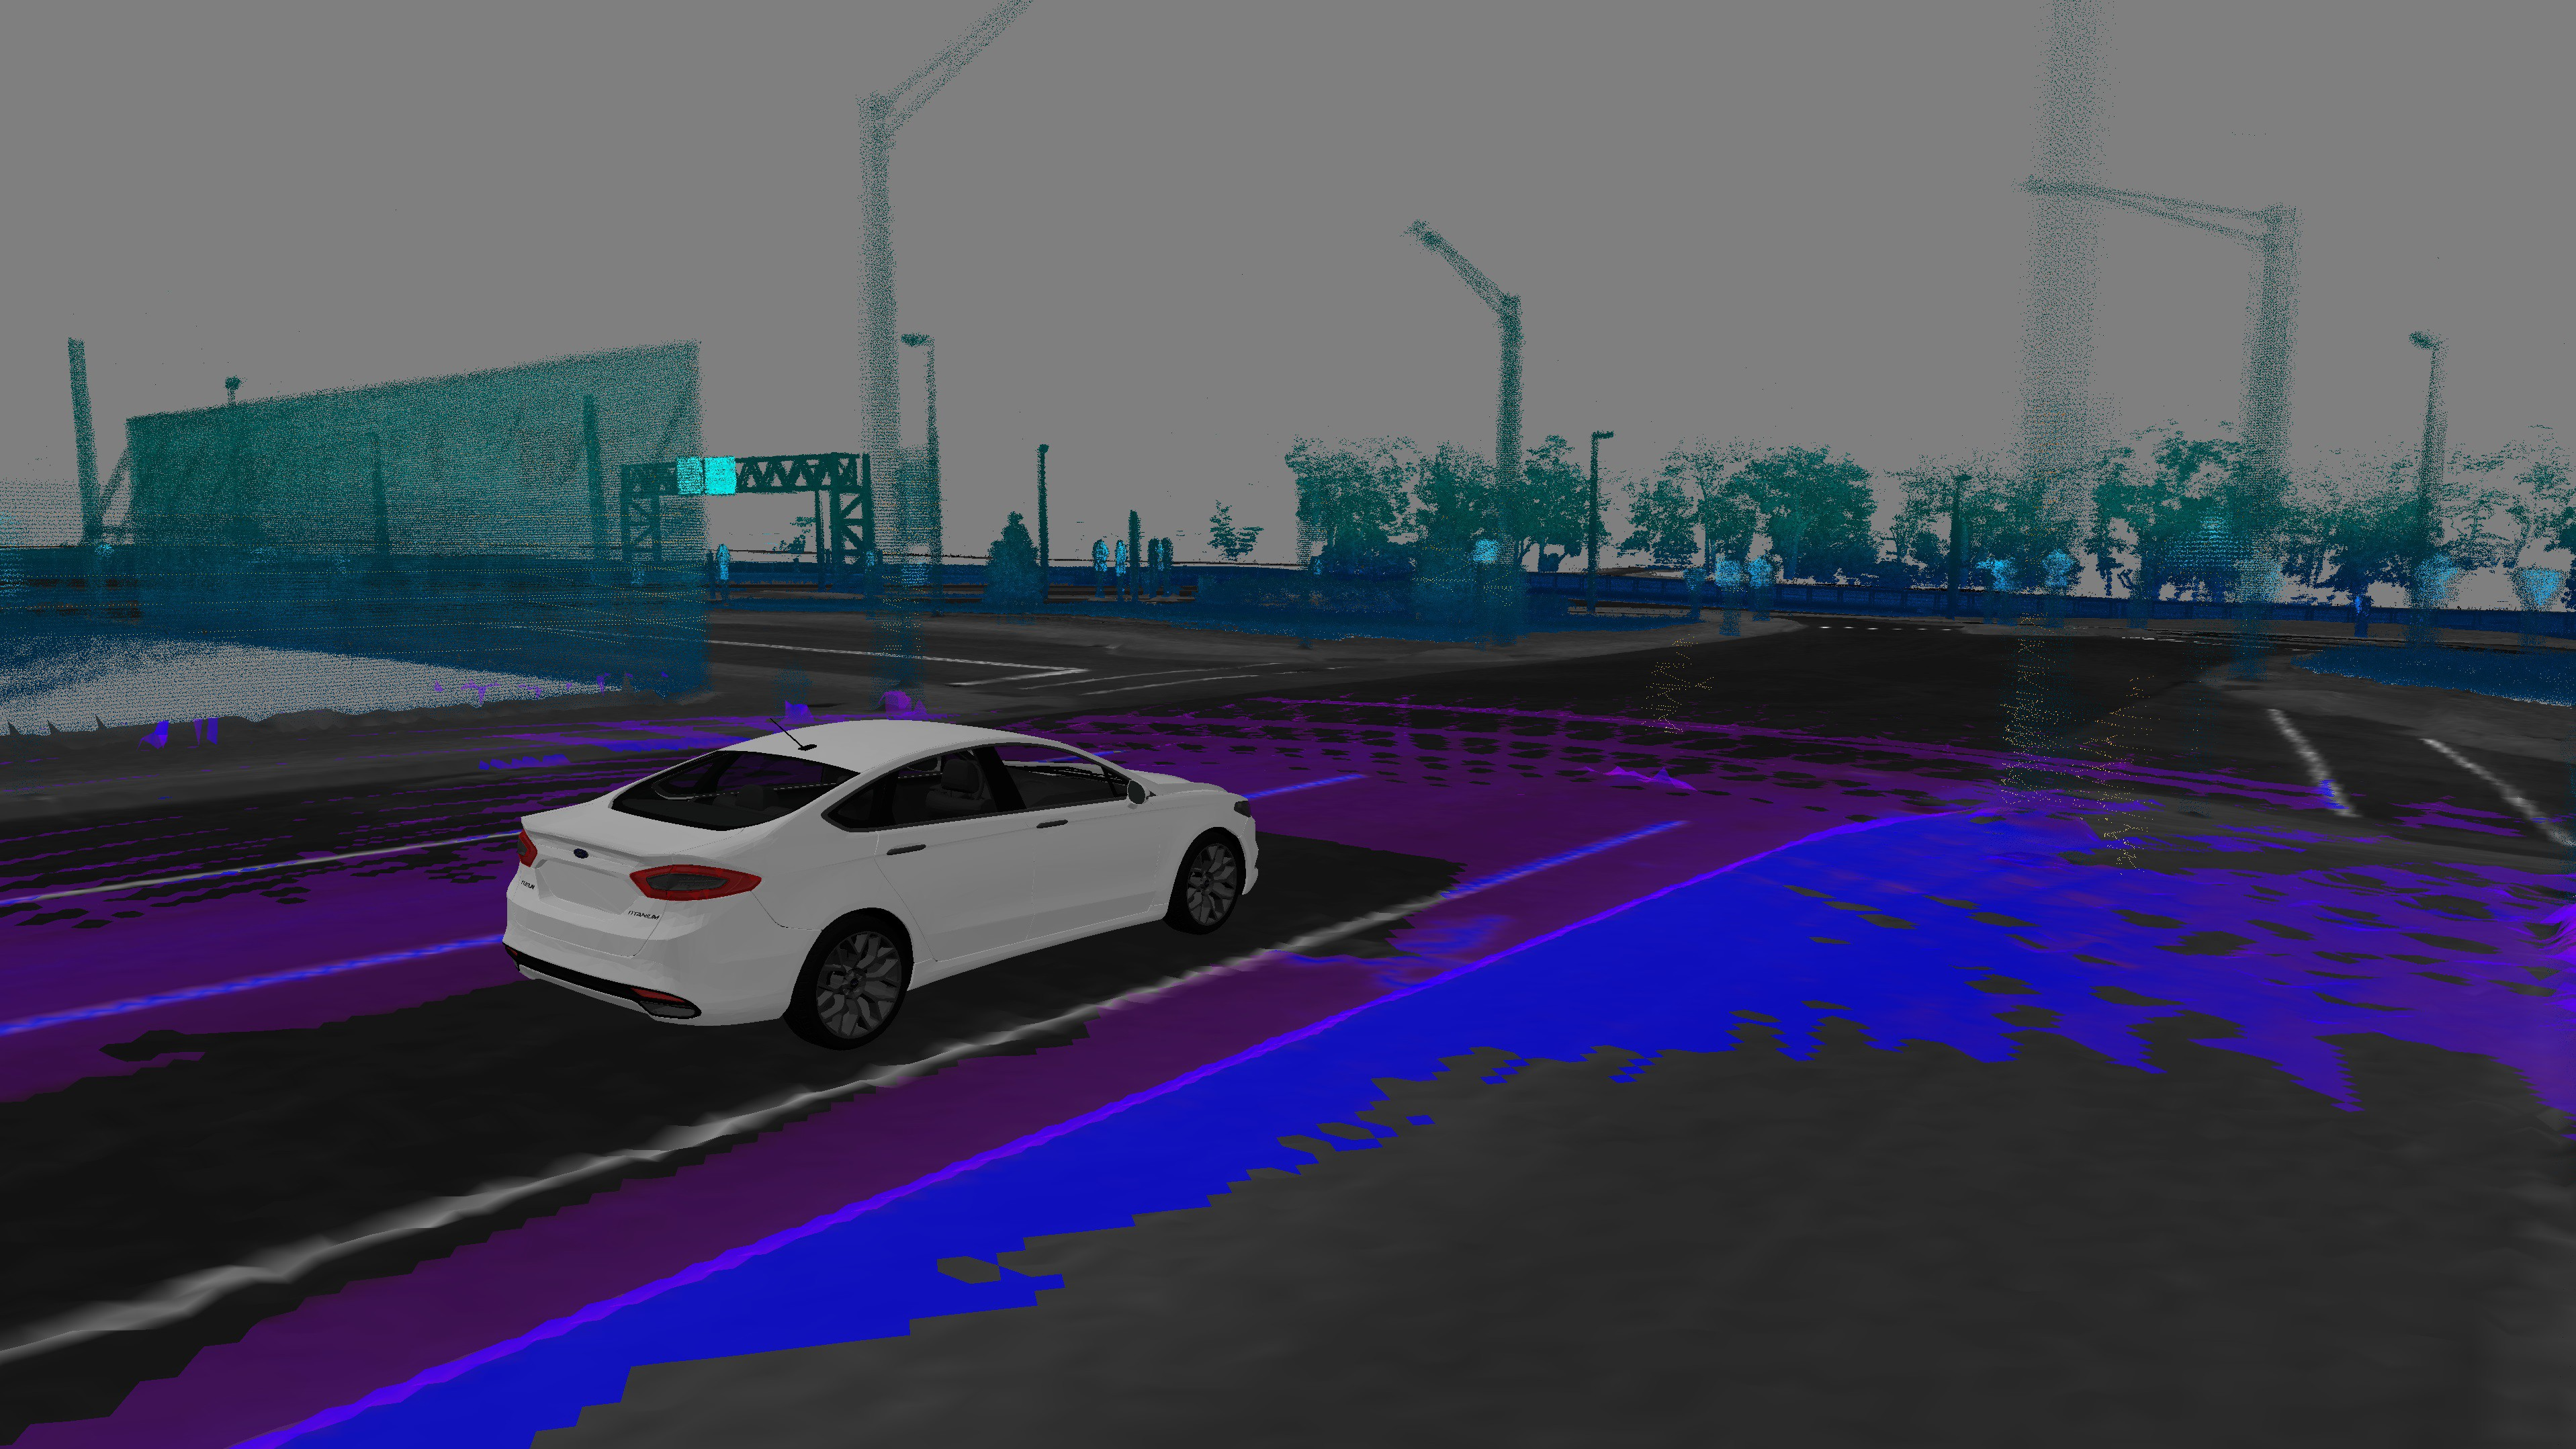 LiDar image of Ford driverless car environment.